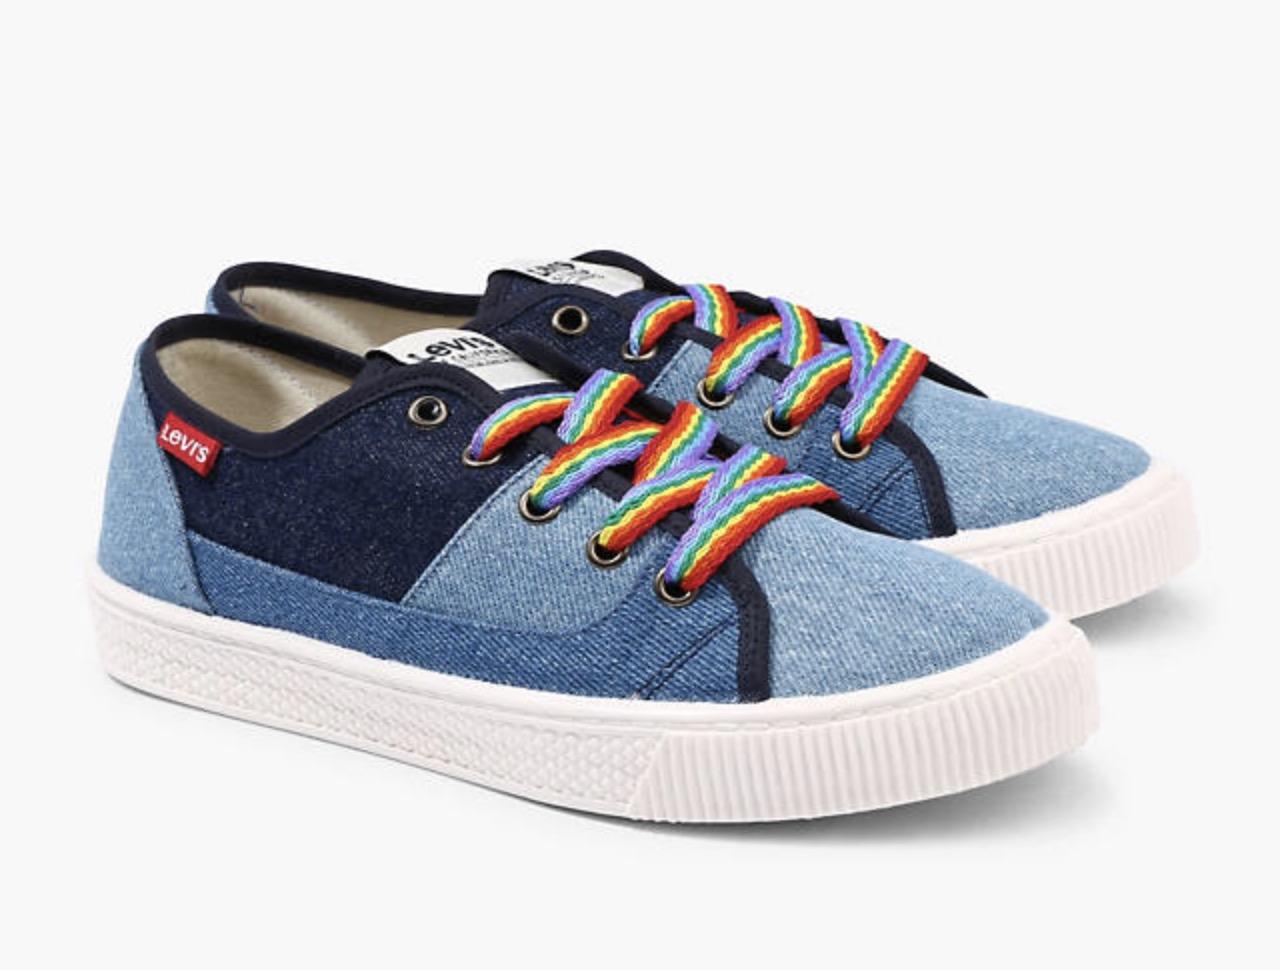 Code promo Levi's : Les Malibu Sneakers Levi's Taille 36 à 22.00€